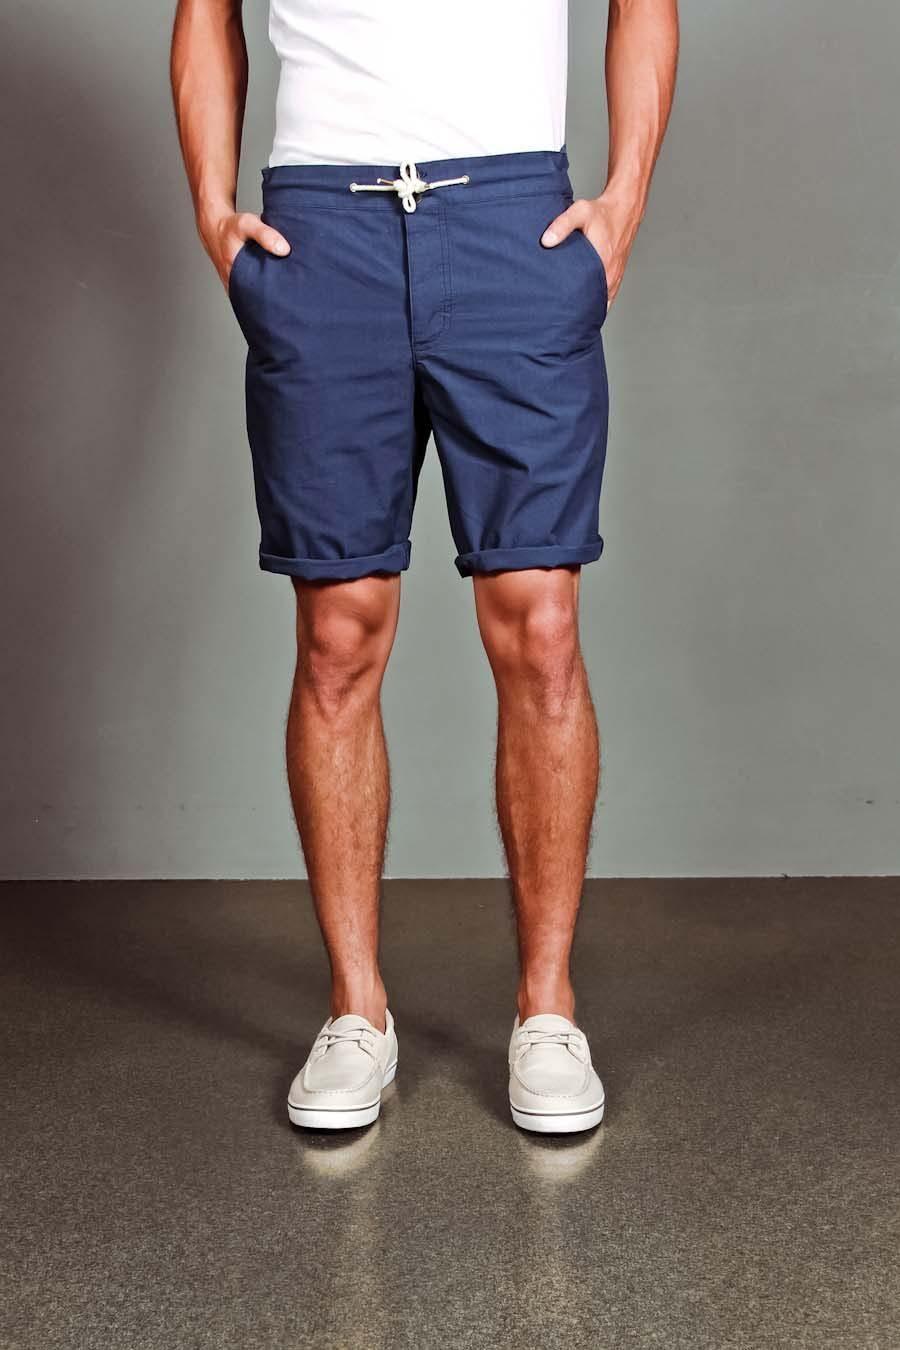 bermuda shorts men